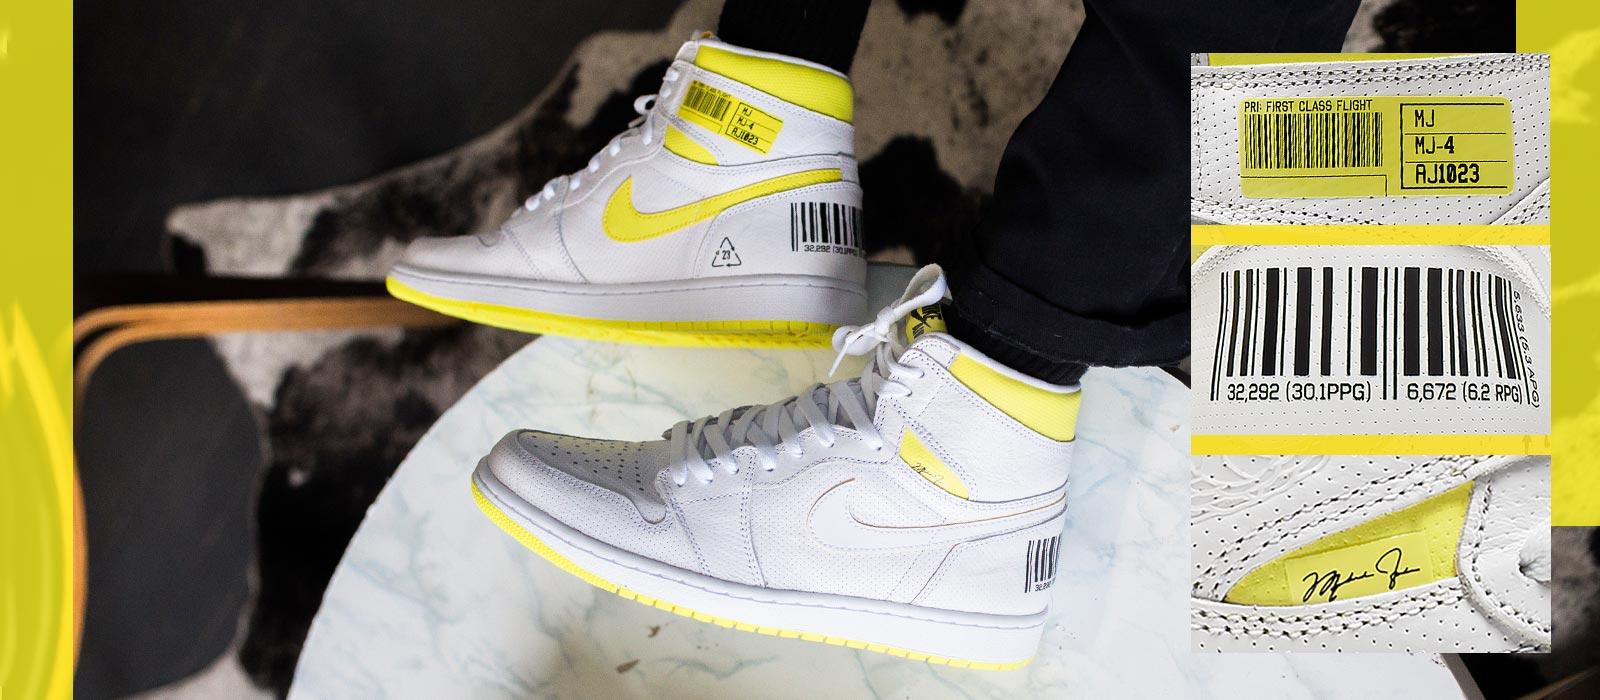 Foot Locker | Because Sneakers | Foot Locker Canada